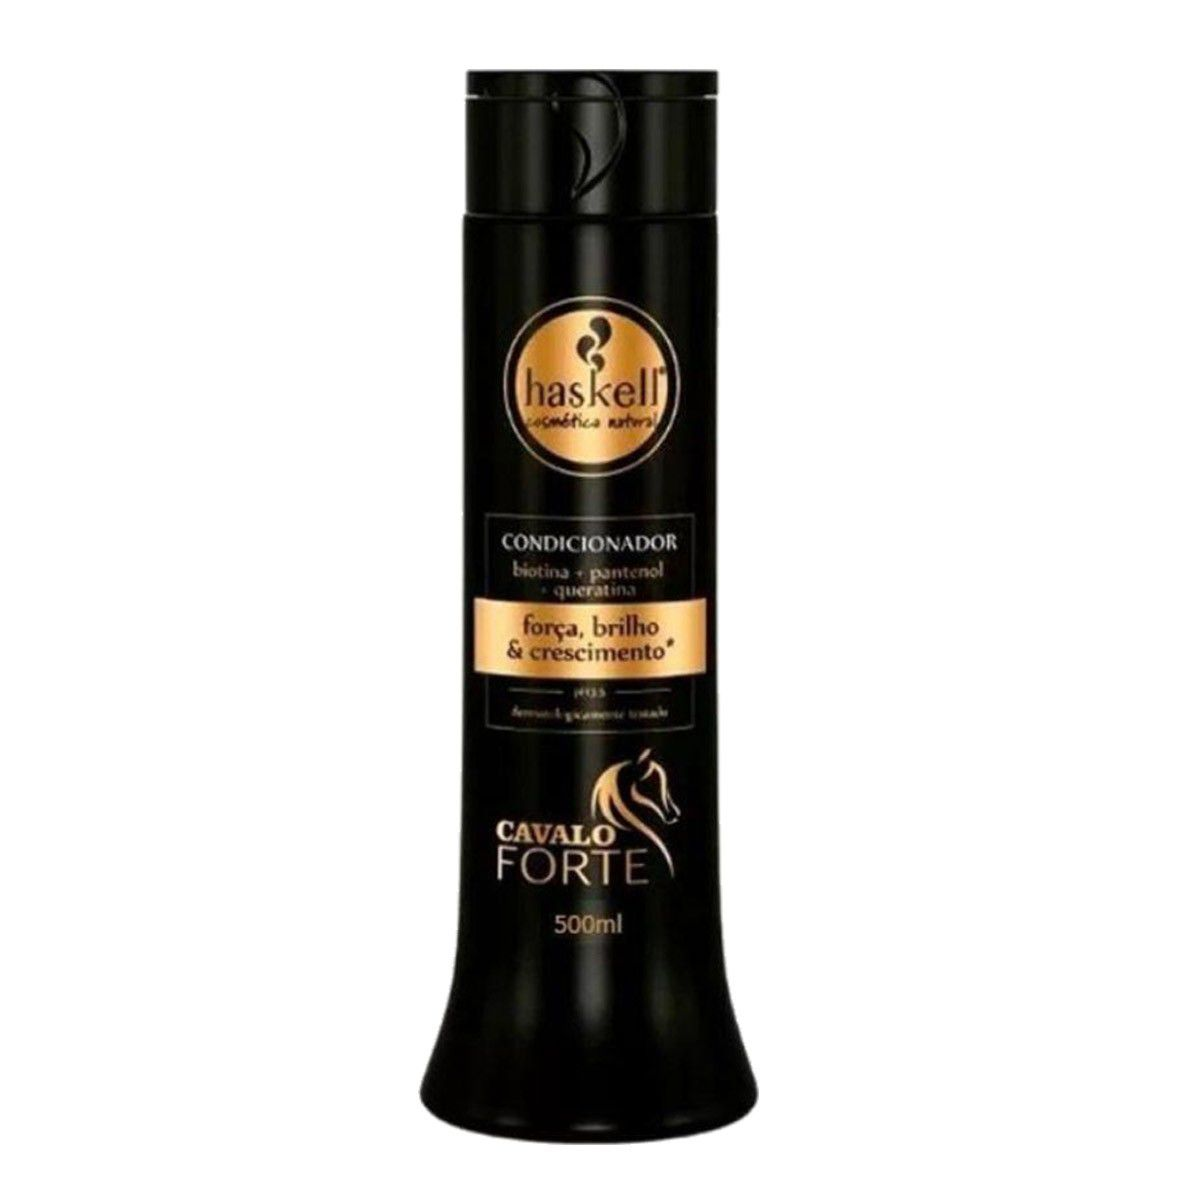 Haskell Cavalo Forte Shampoo 500ml + Condicionador 500ml + Mascara 500g